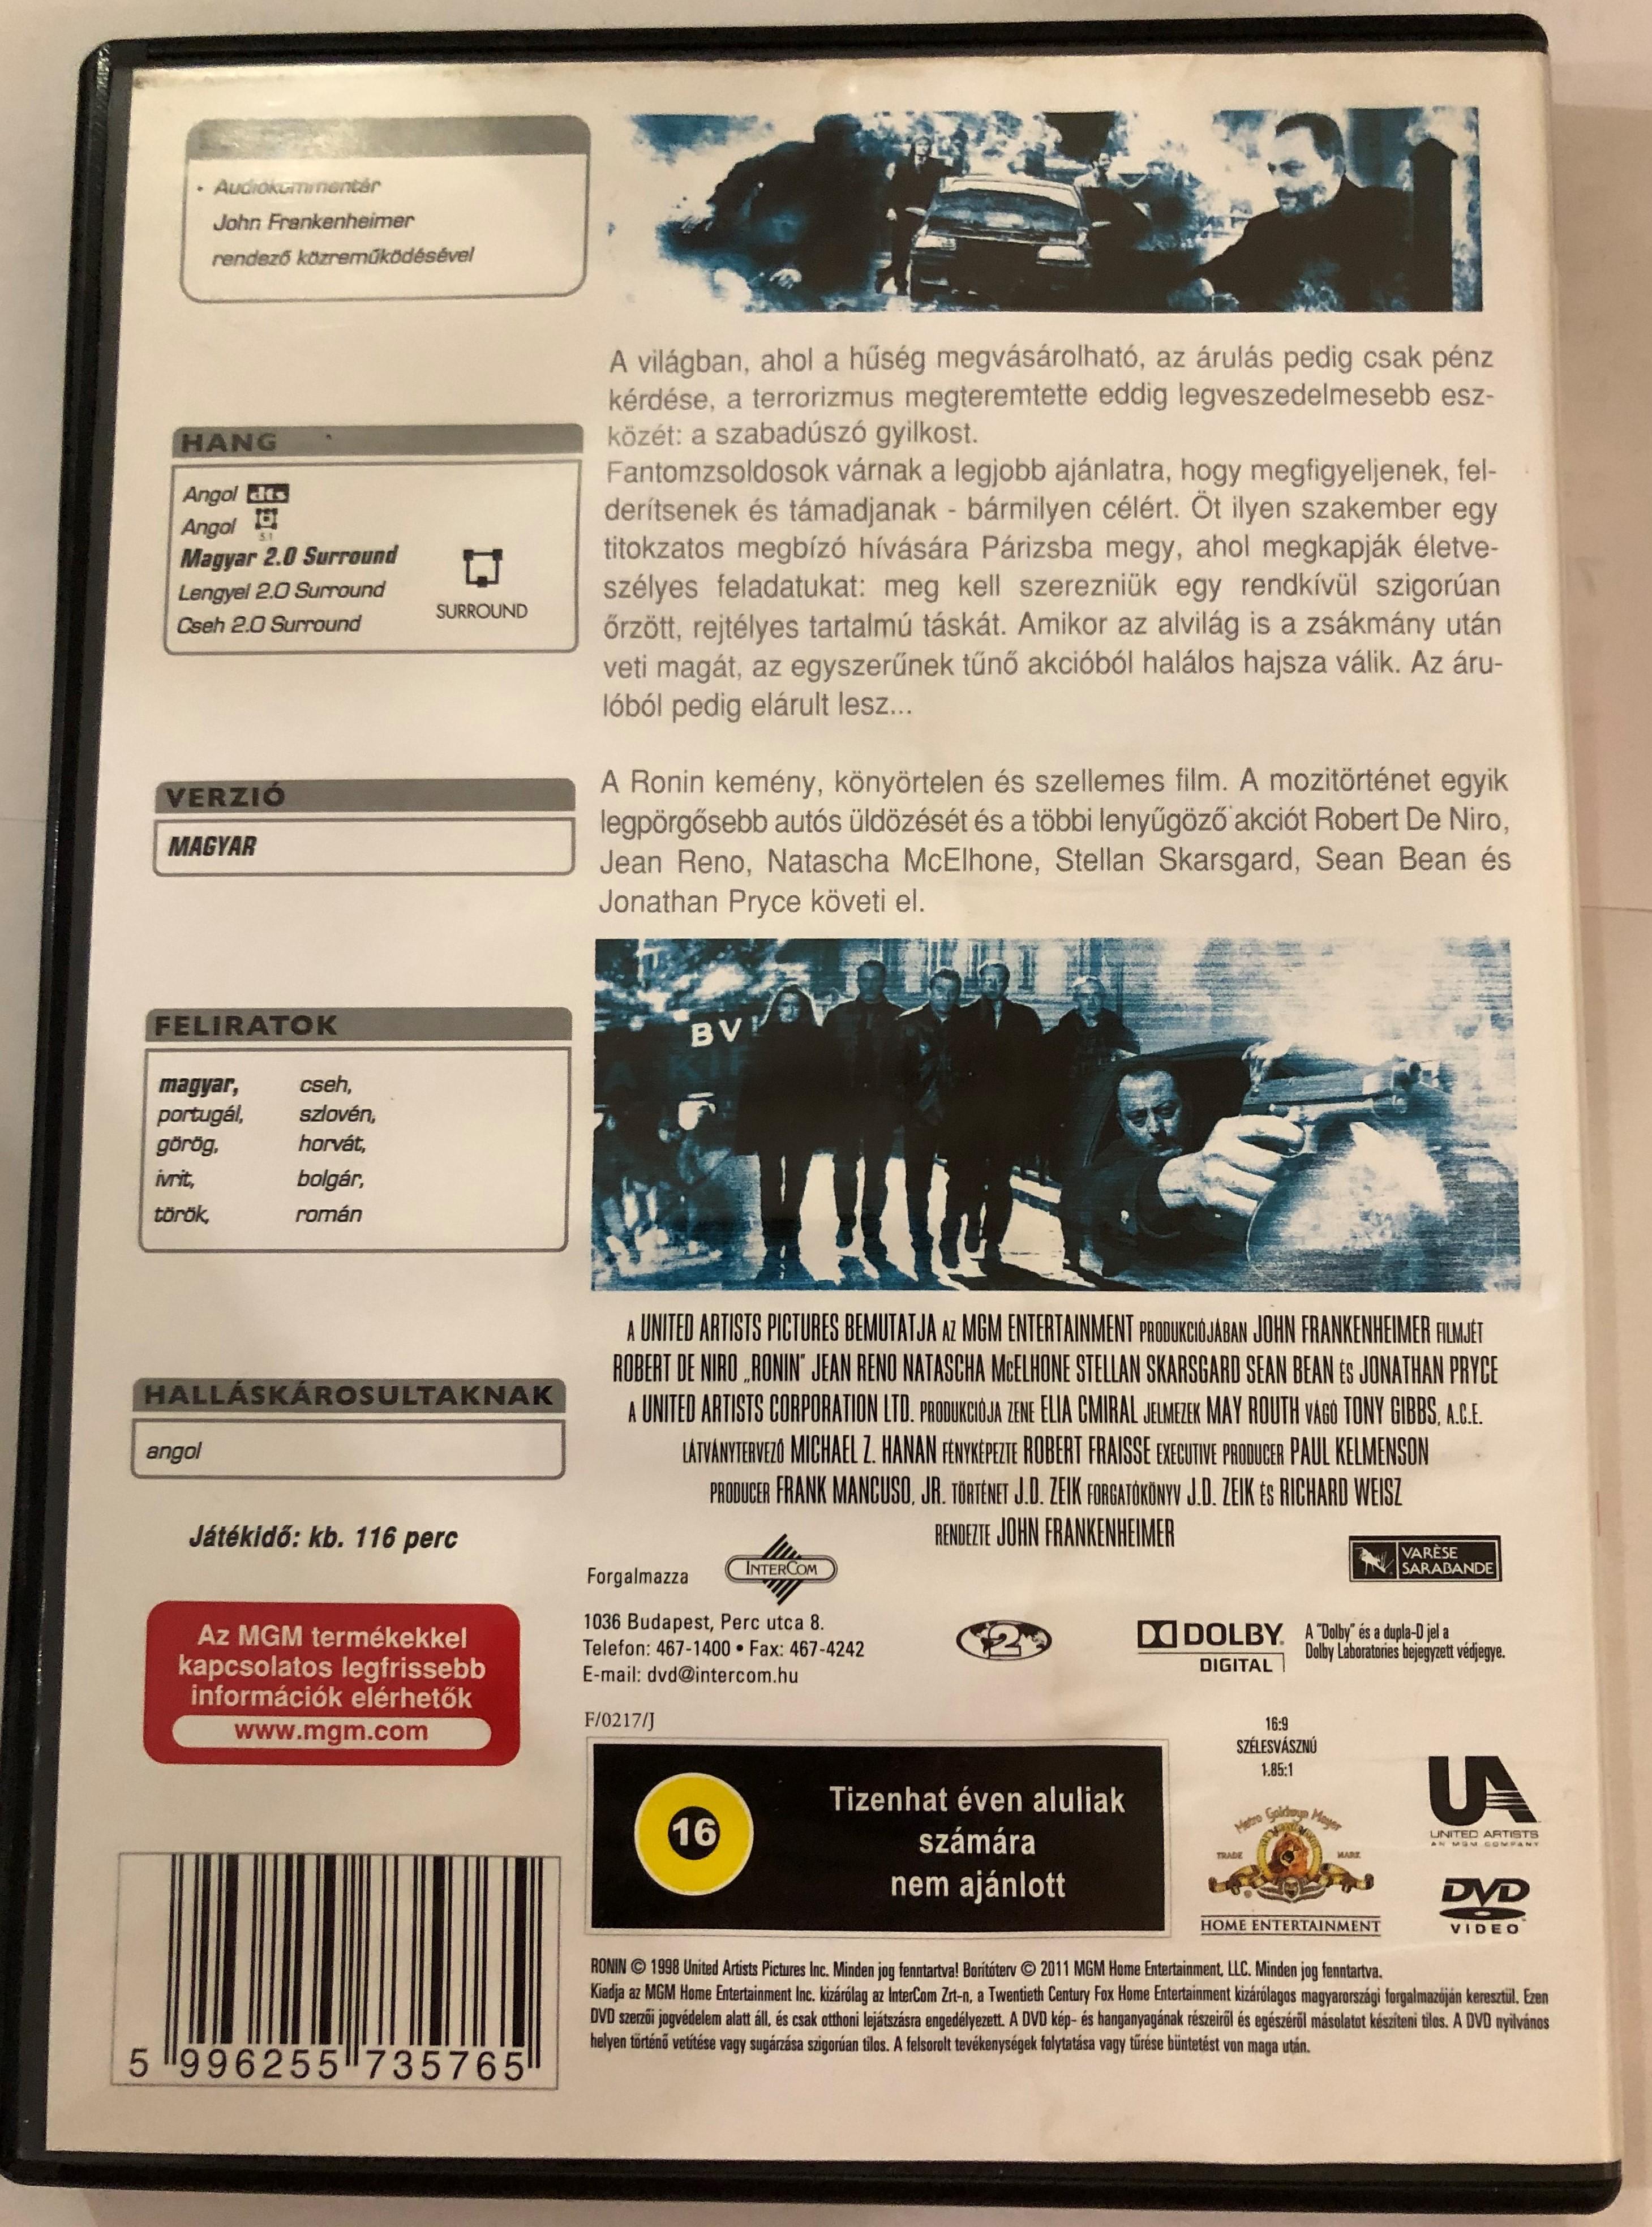 ronin-dvd-1998-directed-by-john-frankenheimer-starring-robert-de-niro-jean-reno-2-.jpg